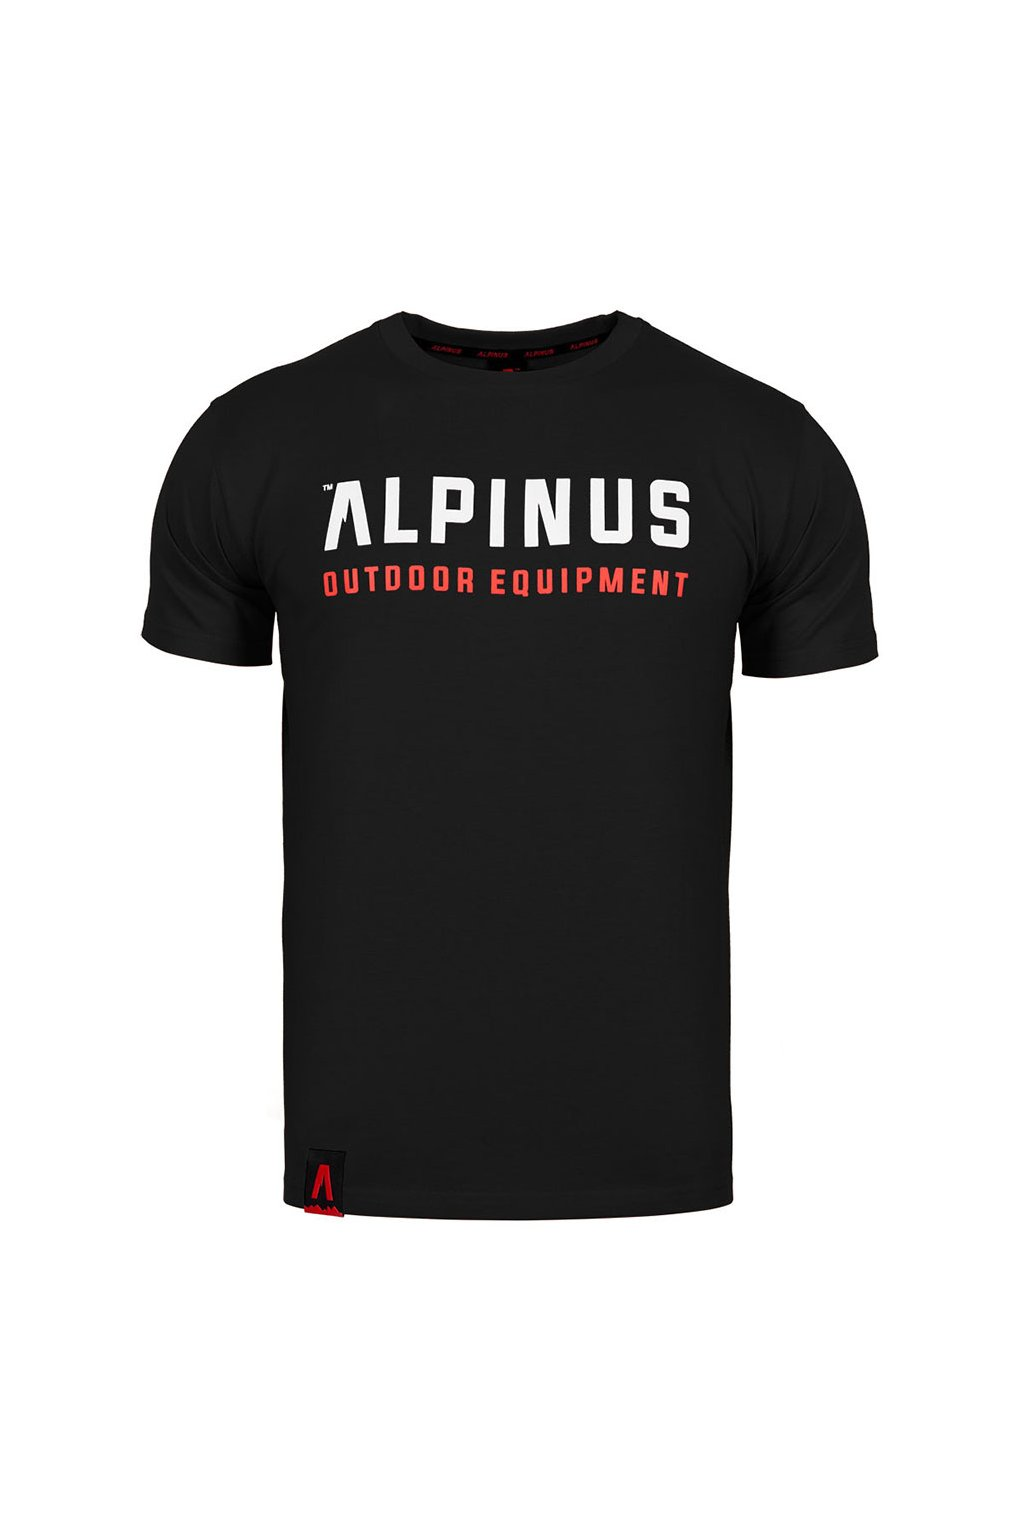 Pánske tričko Alpinus Outdoor Eqpt. čierne ALP20TC0033